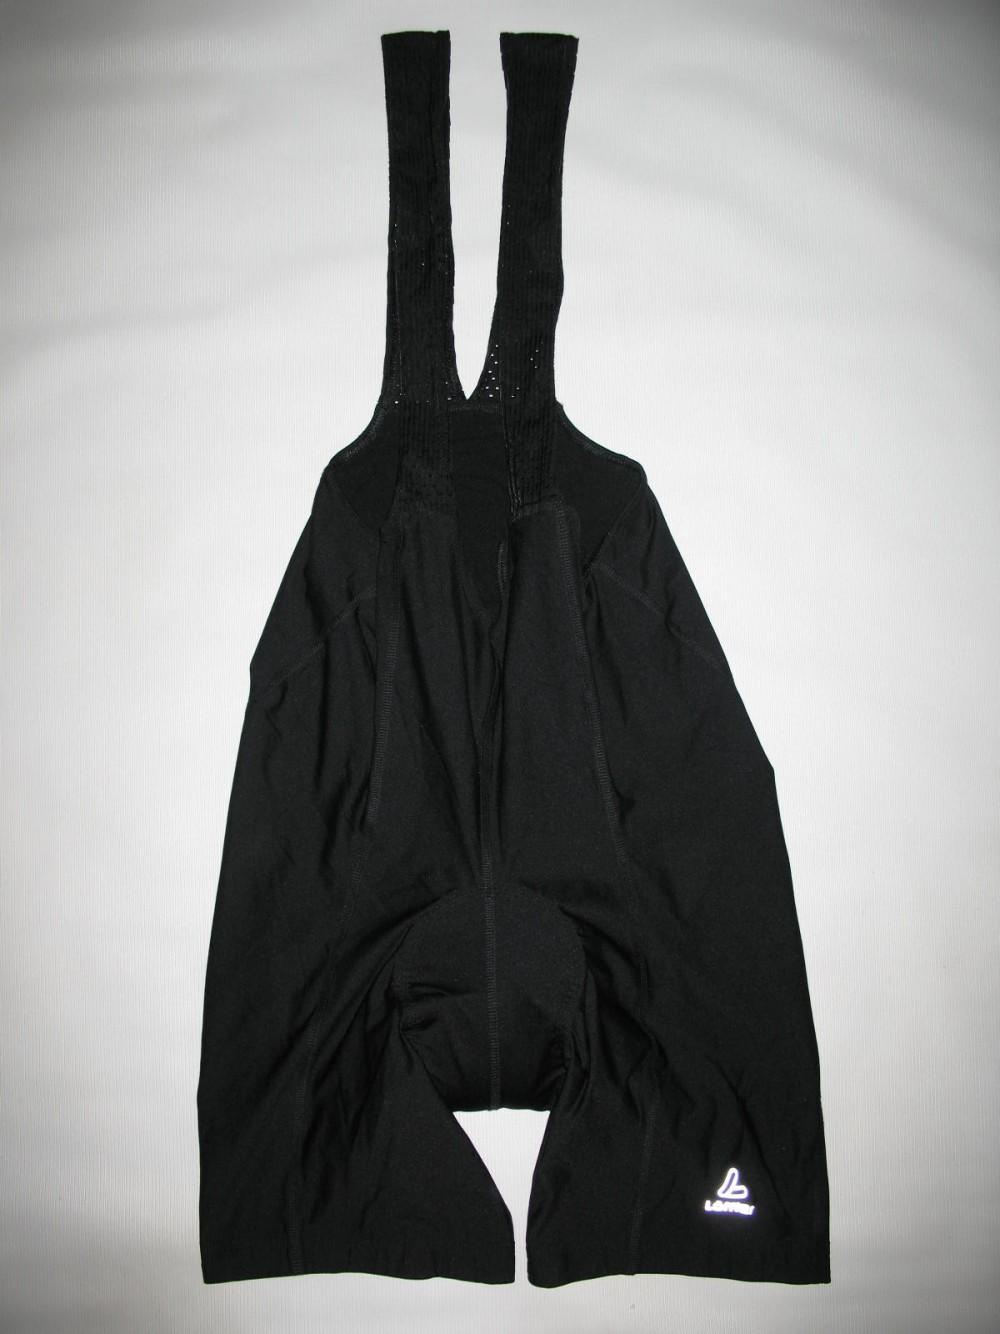 Велошорты LOFFLER bib cycling shorts (размер 56/XXL) - 2